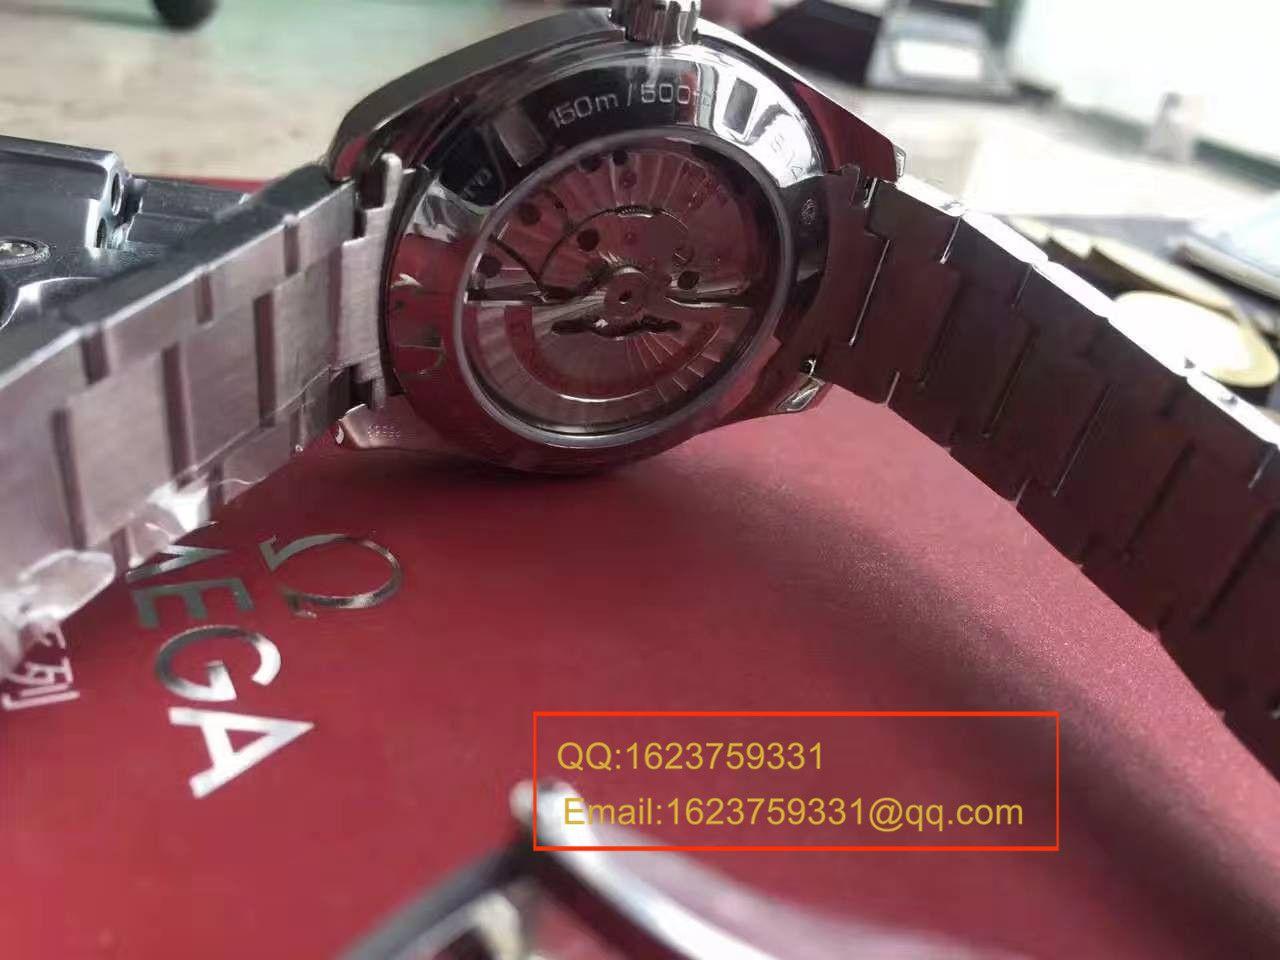 【KW厂顶级1:1高仿手表】欧米茄海马系列231.10.42.21.02.002(金针队长)男表 / M139